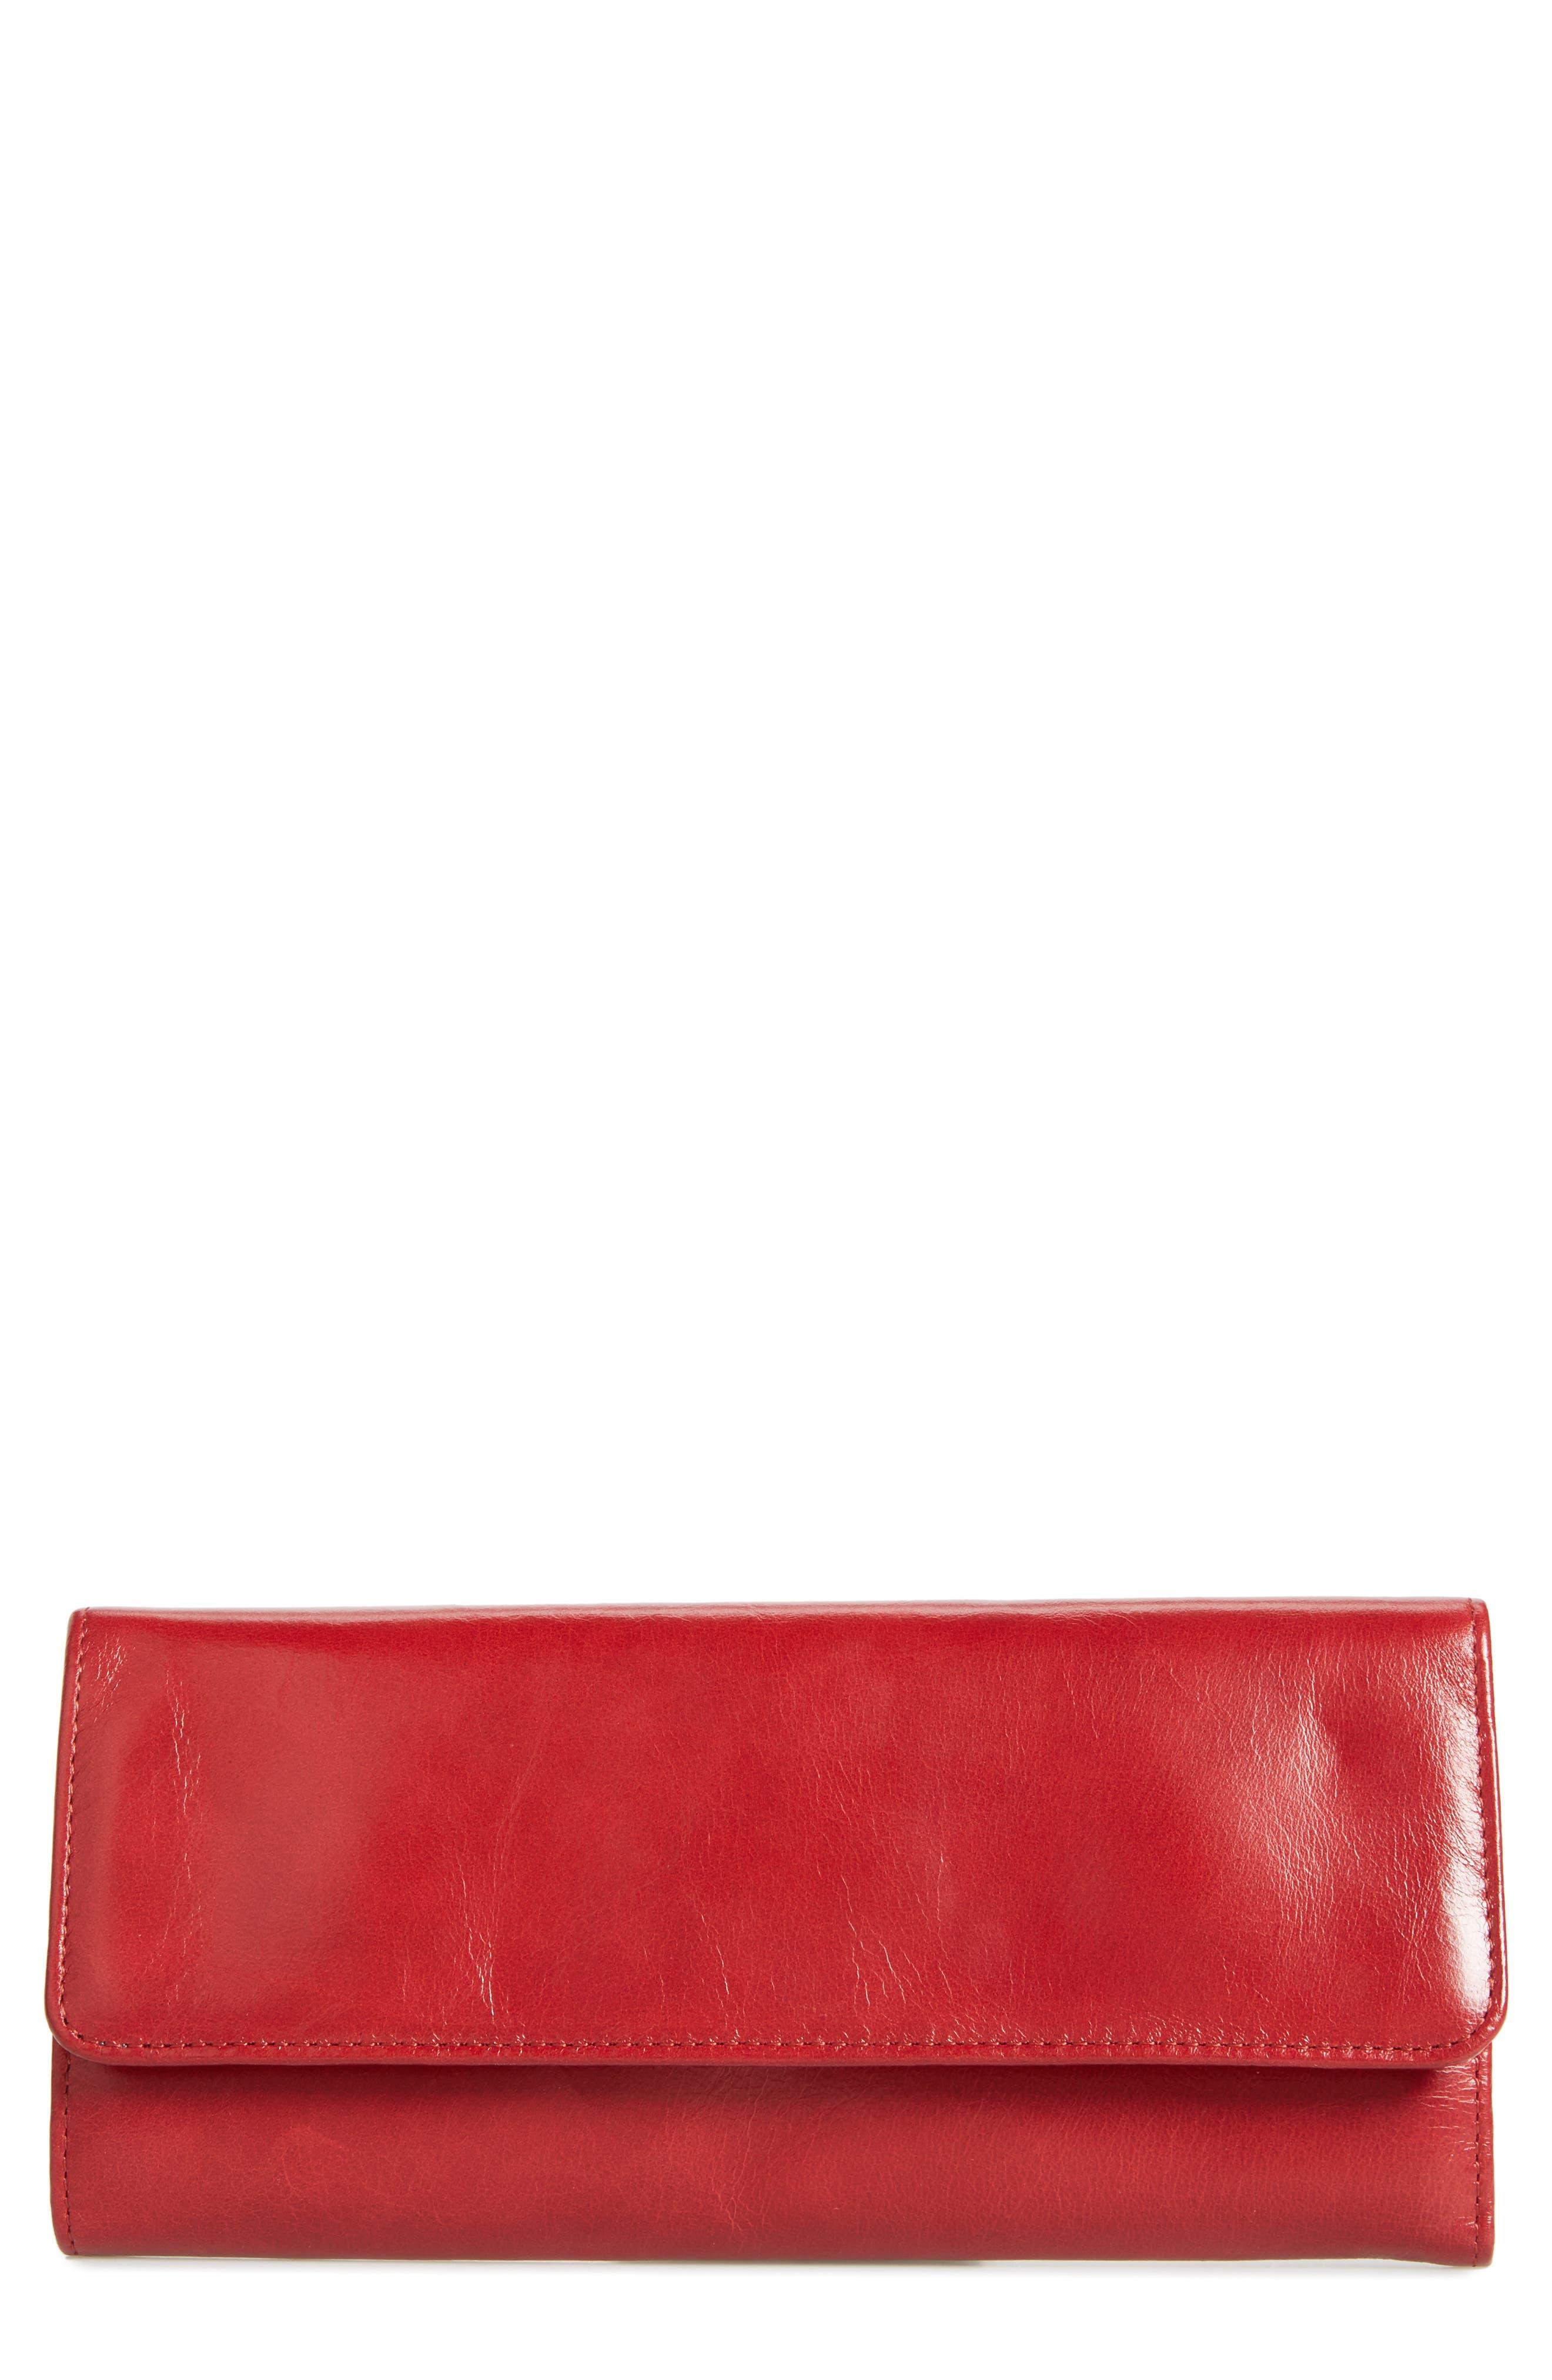 'Sadie' Leather Wallet,                             Main thumbnail 9, color,